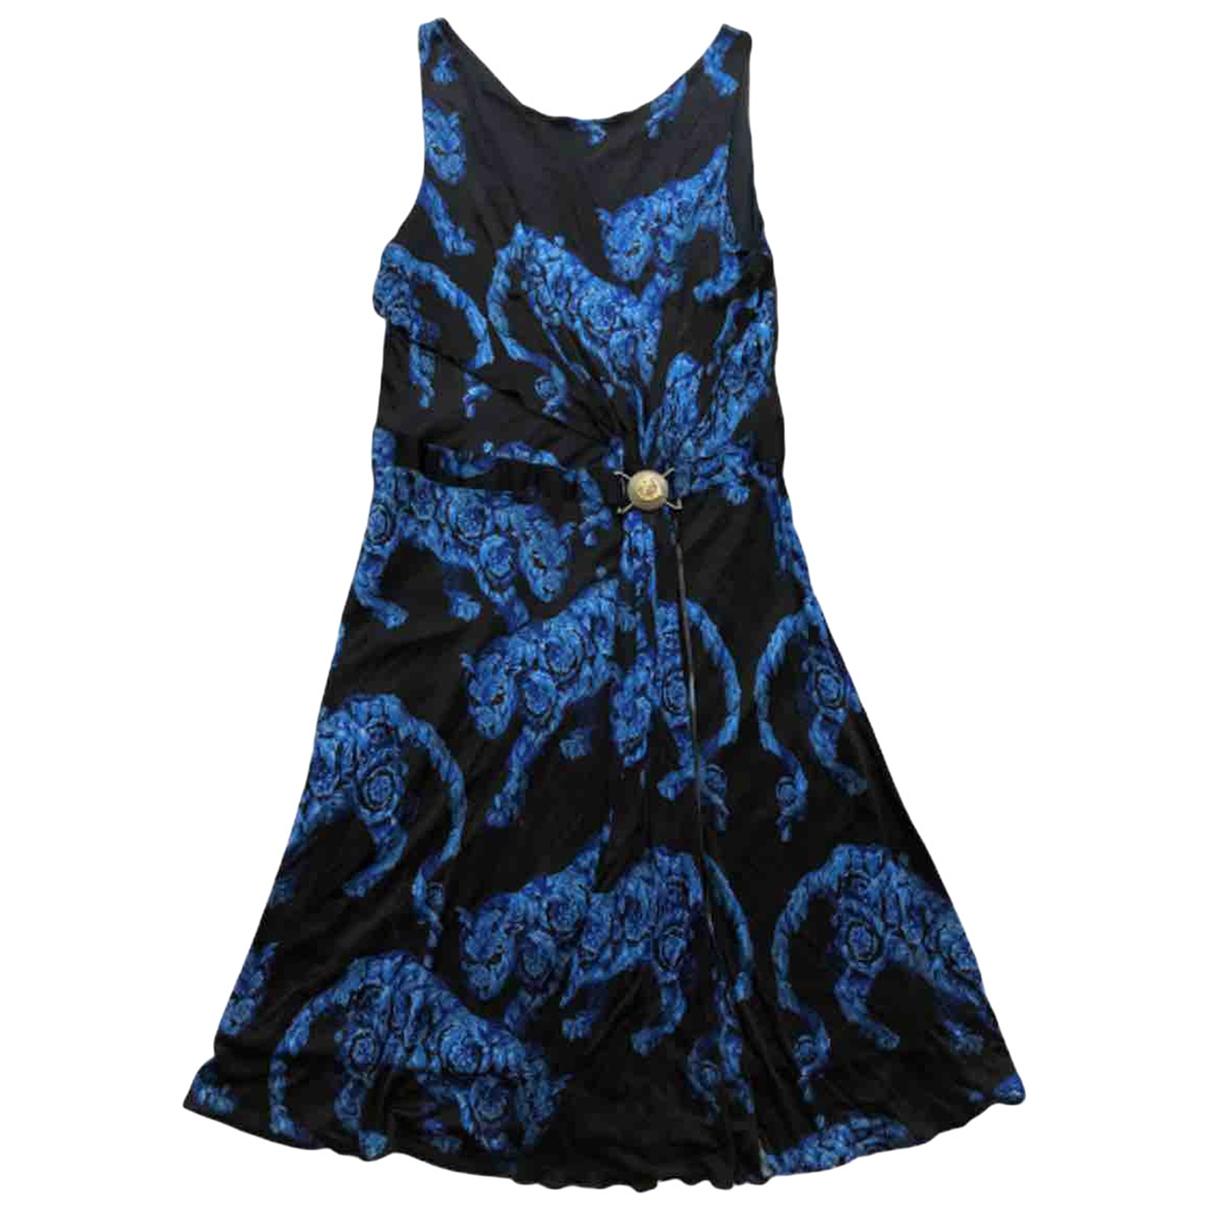 Gianni Versace \N Black dress for Women 44 IT